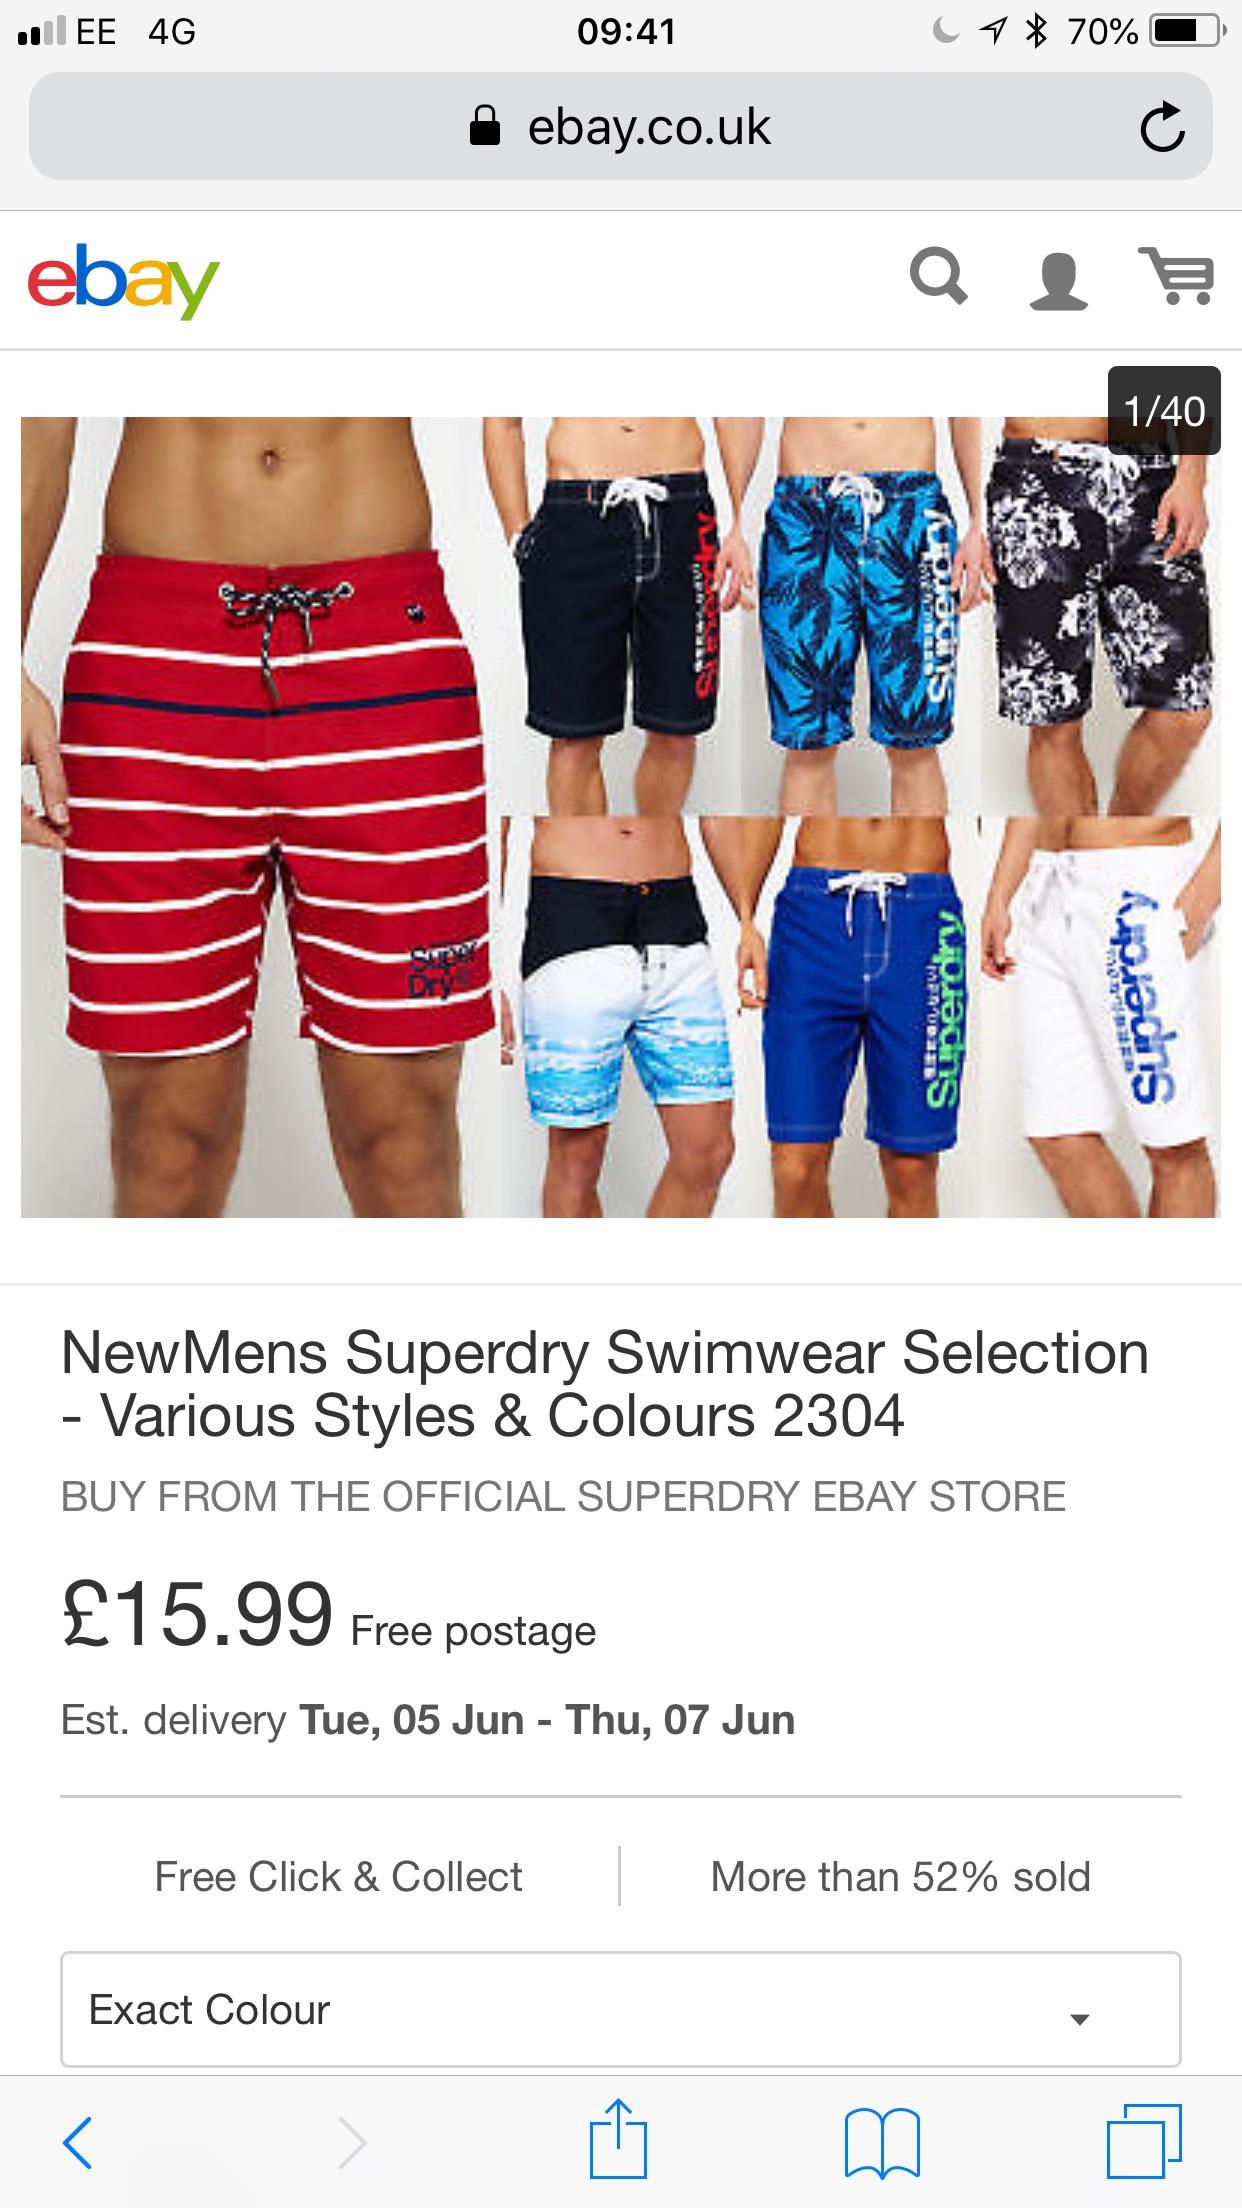 Superdry swimwear men £15.99 - ebay Superdry store